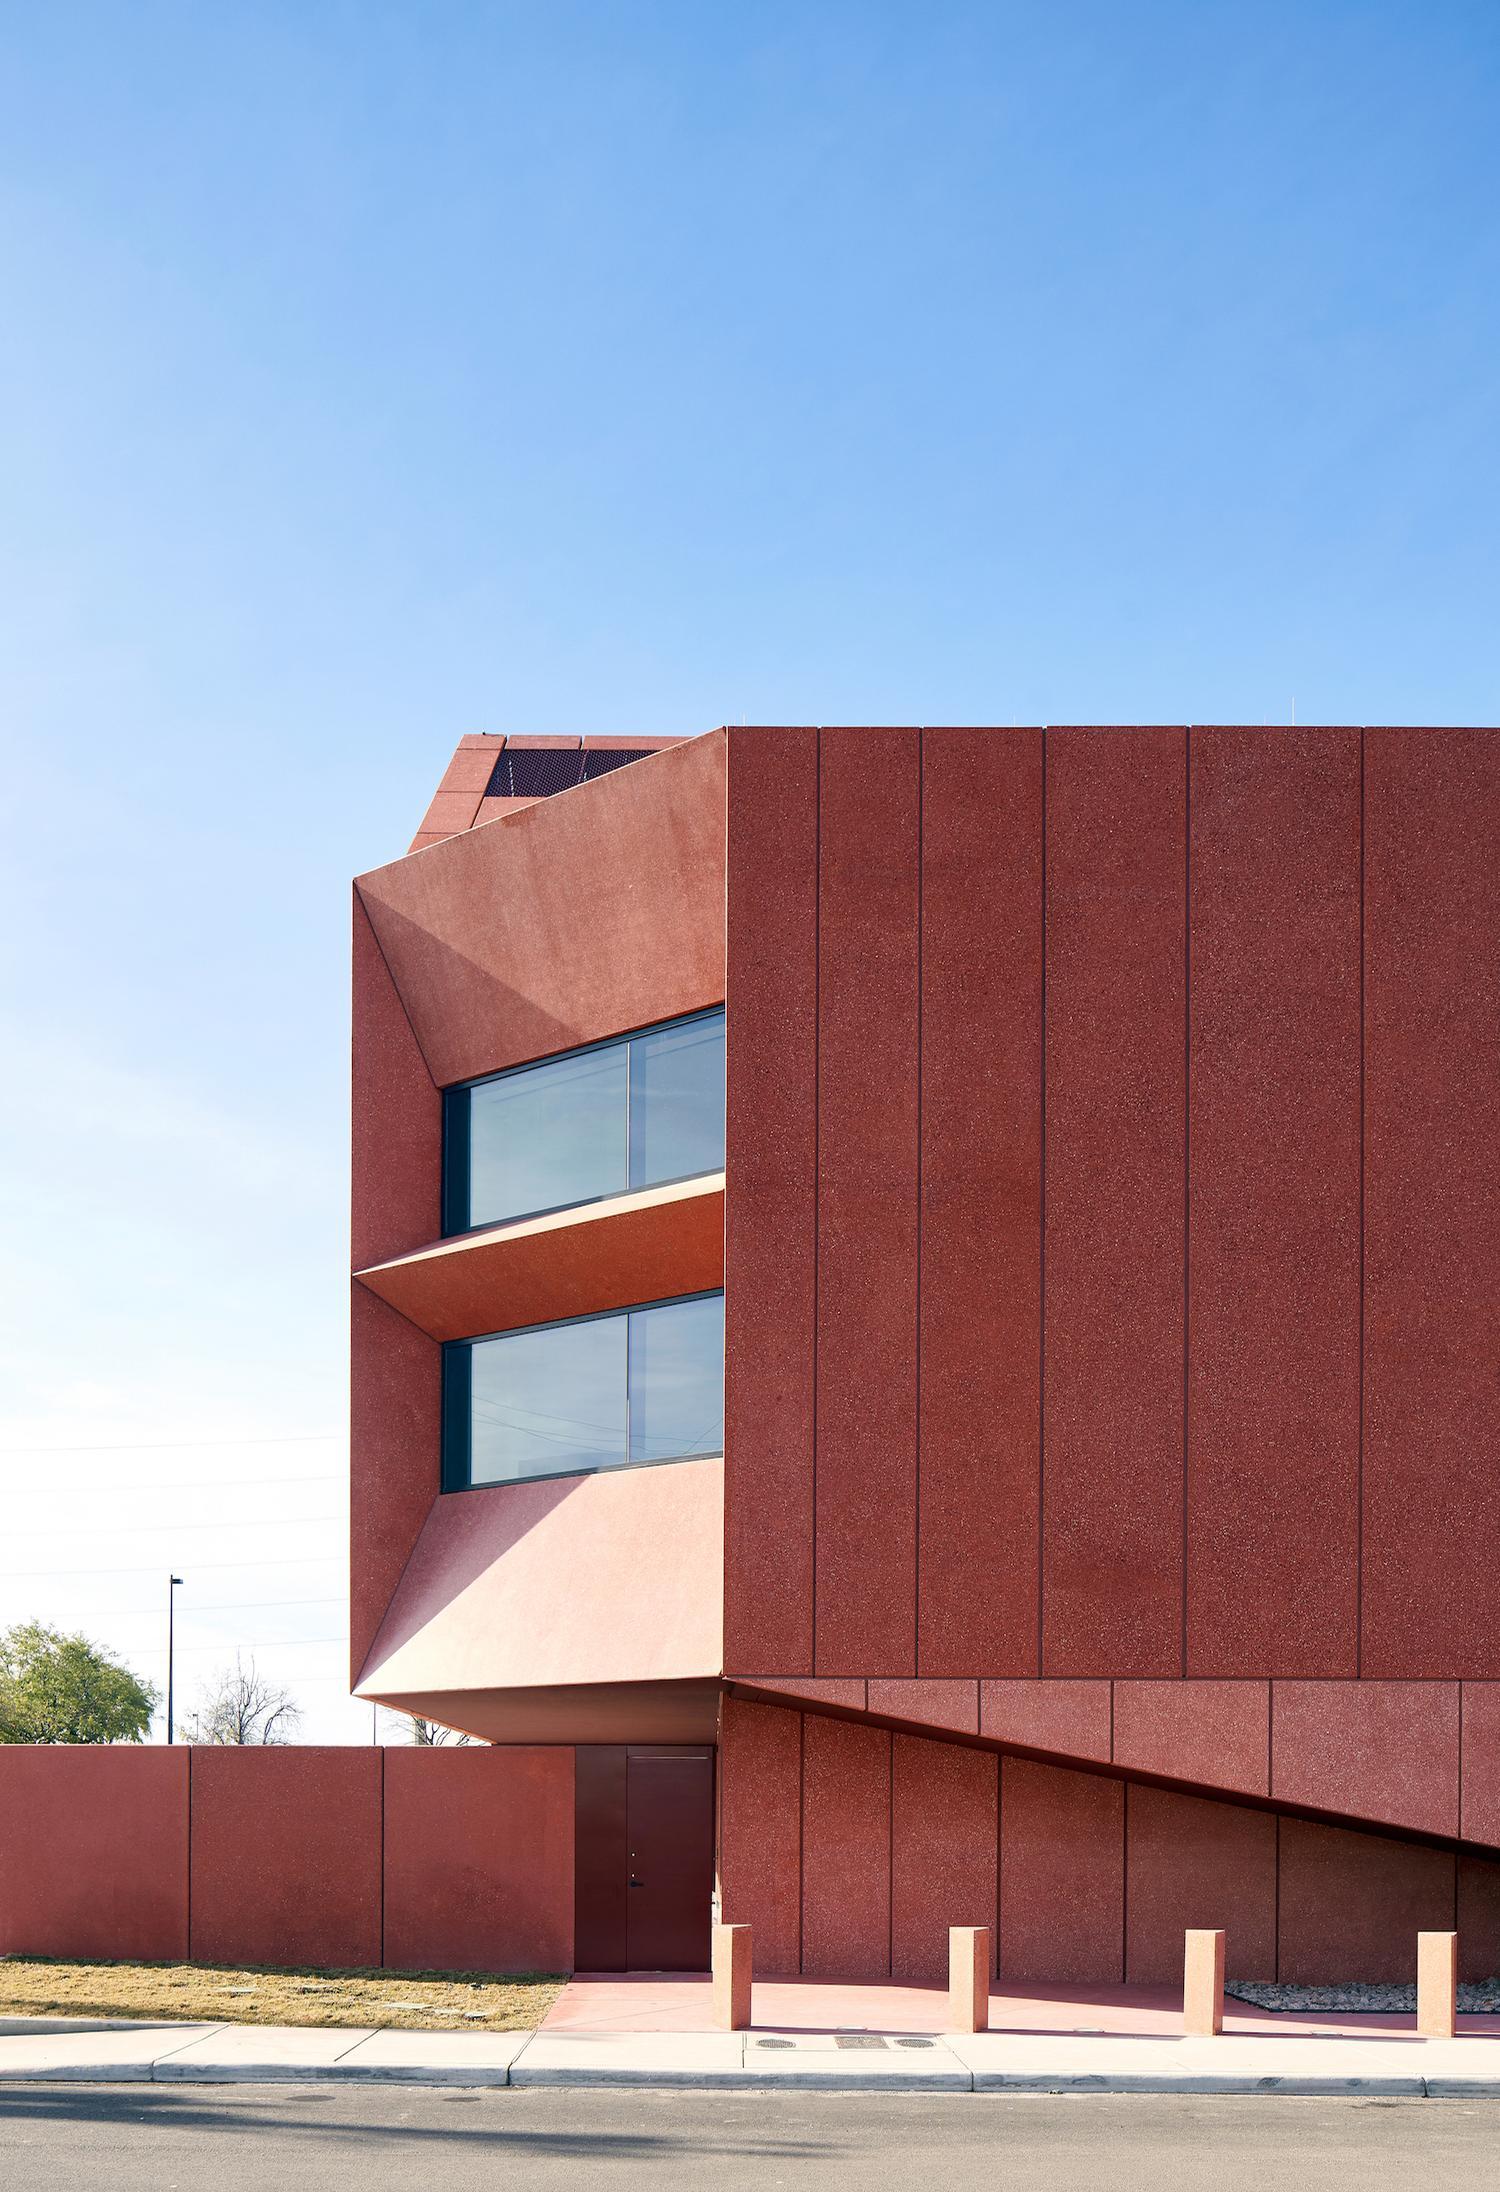 The building covers 14,000sq ft (1,300sq m) / Dror Baldinger